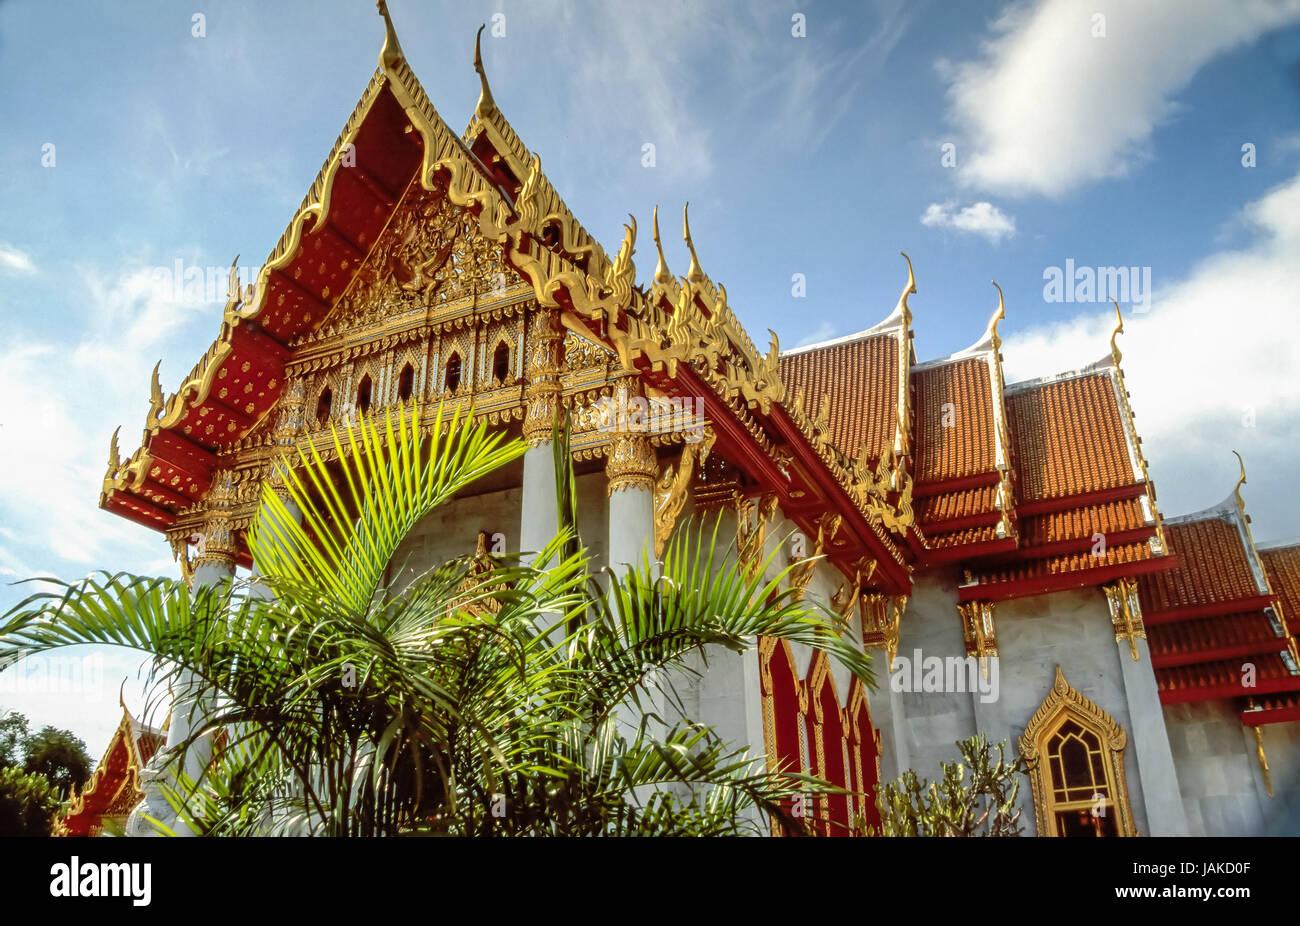 Buddhistischer Tempel Wat Benchamabophit in Bangkok, Thailand Stock Photo